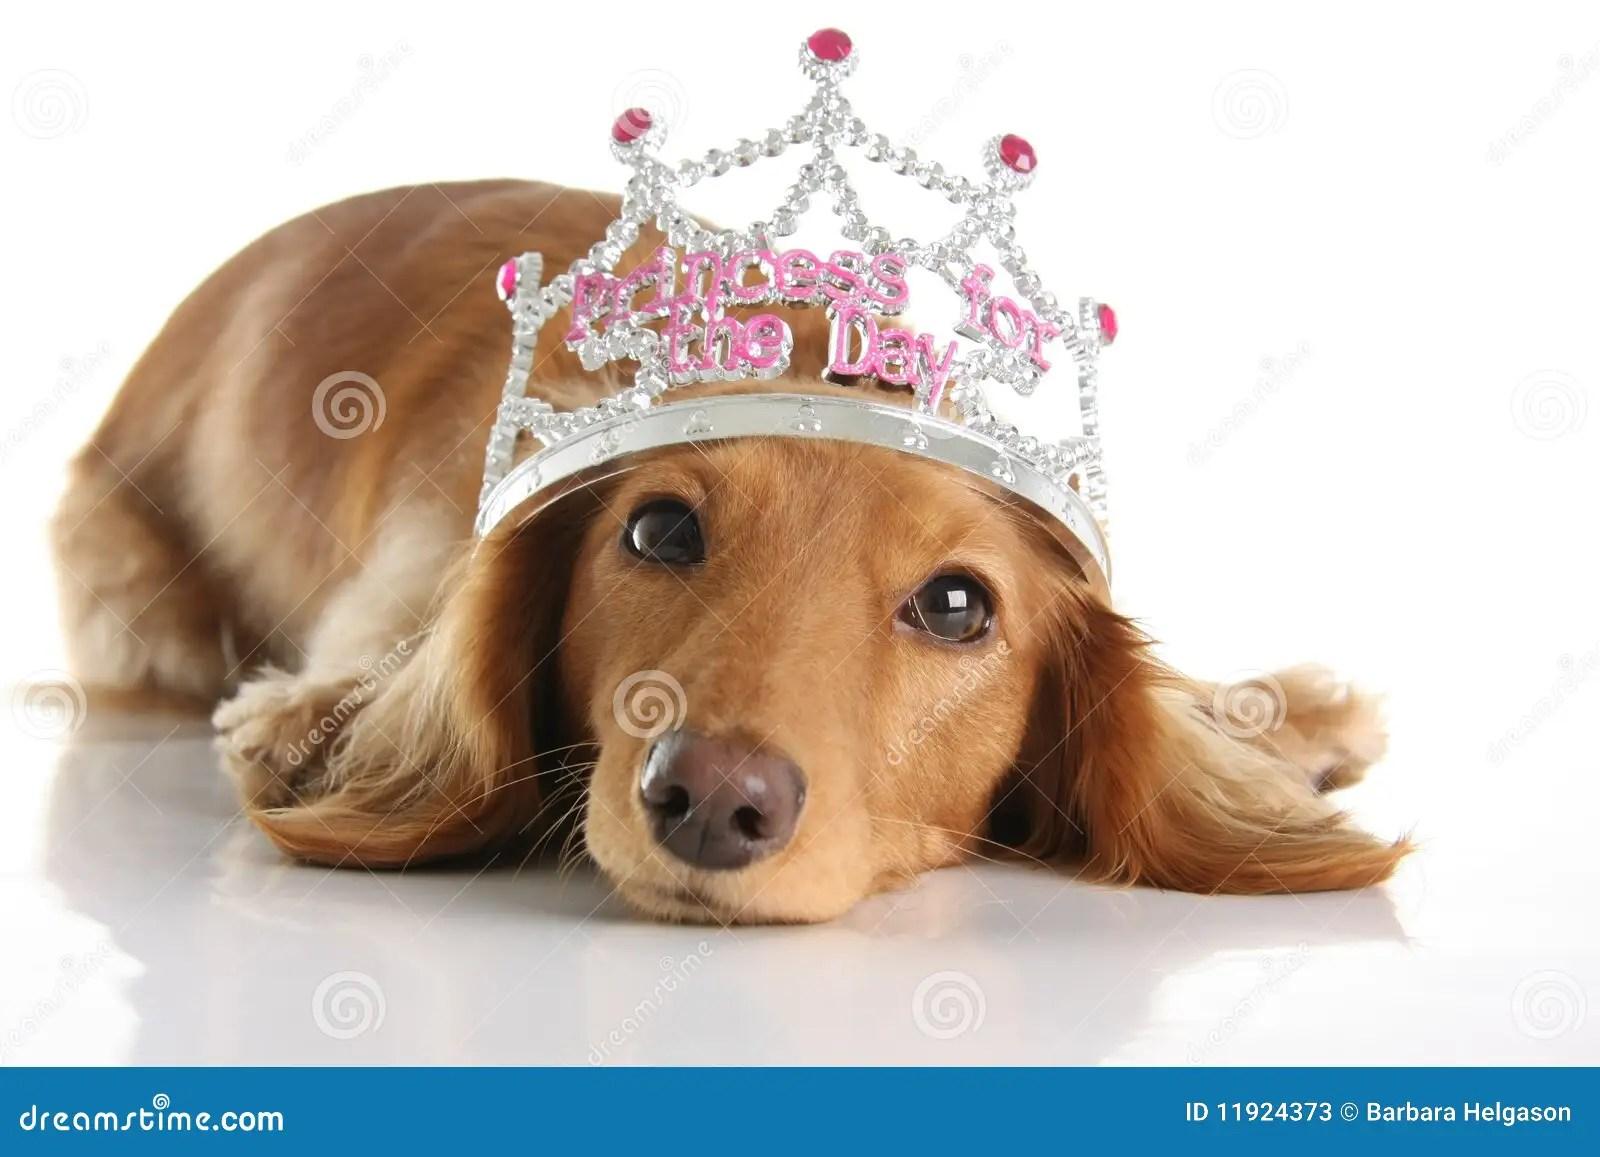 Dachshund Princess Stock Image Image Of Doggy Creature